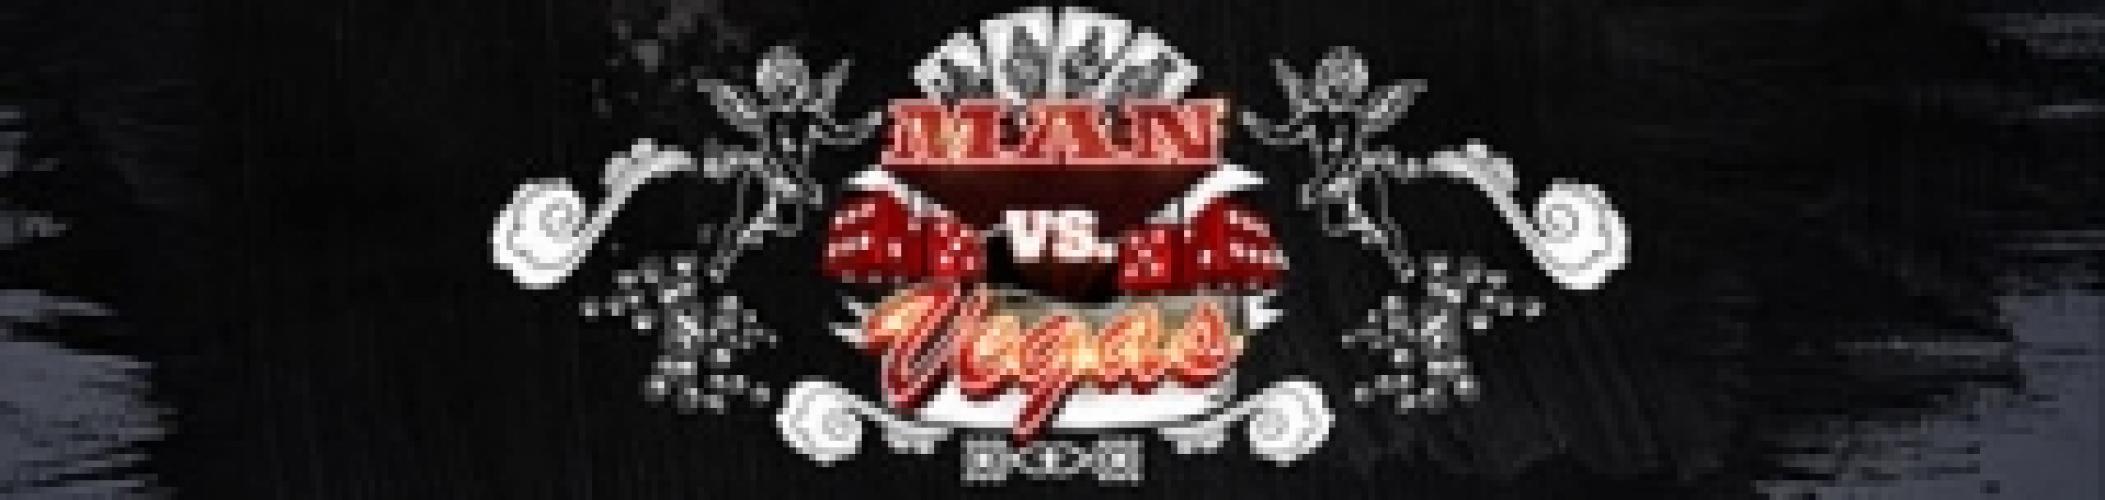 Man vs Vegas next episode air date poster